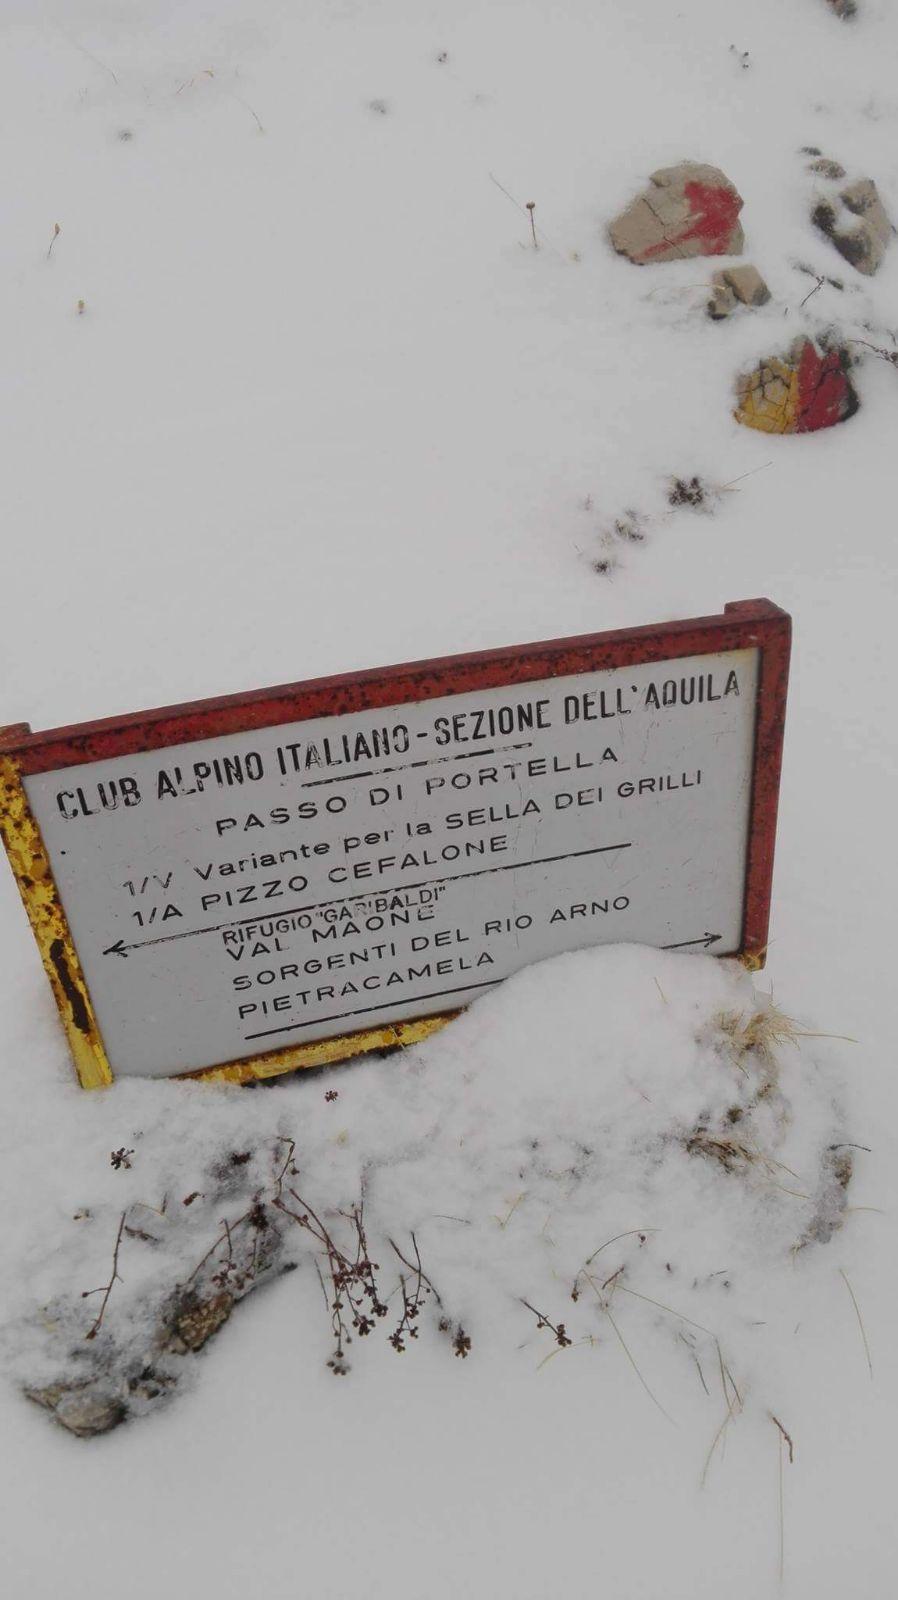 Ghiacciaio del Calderone in agonia-whatsapp-image-2017-09-20-at-18.54.45.jpeg